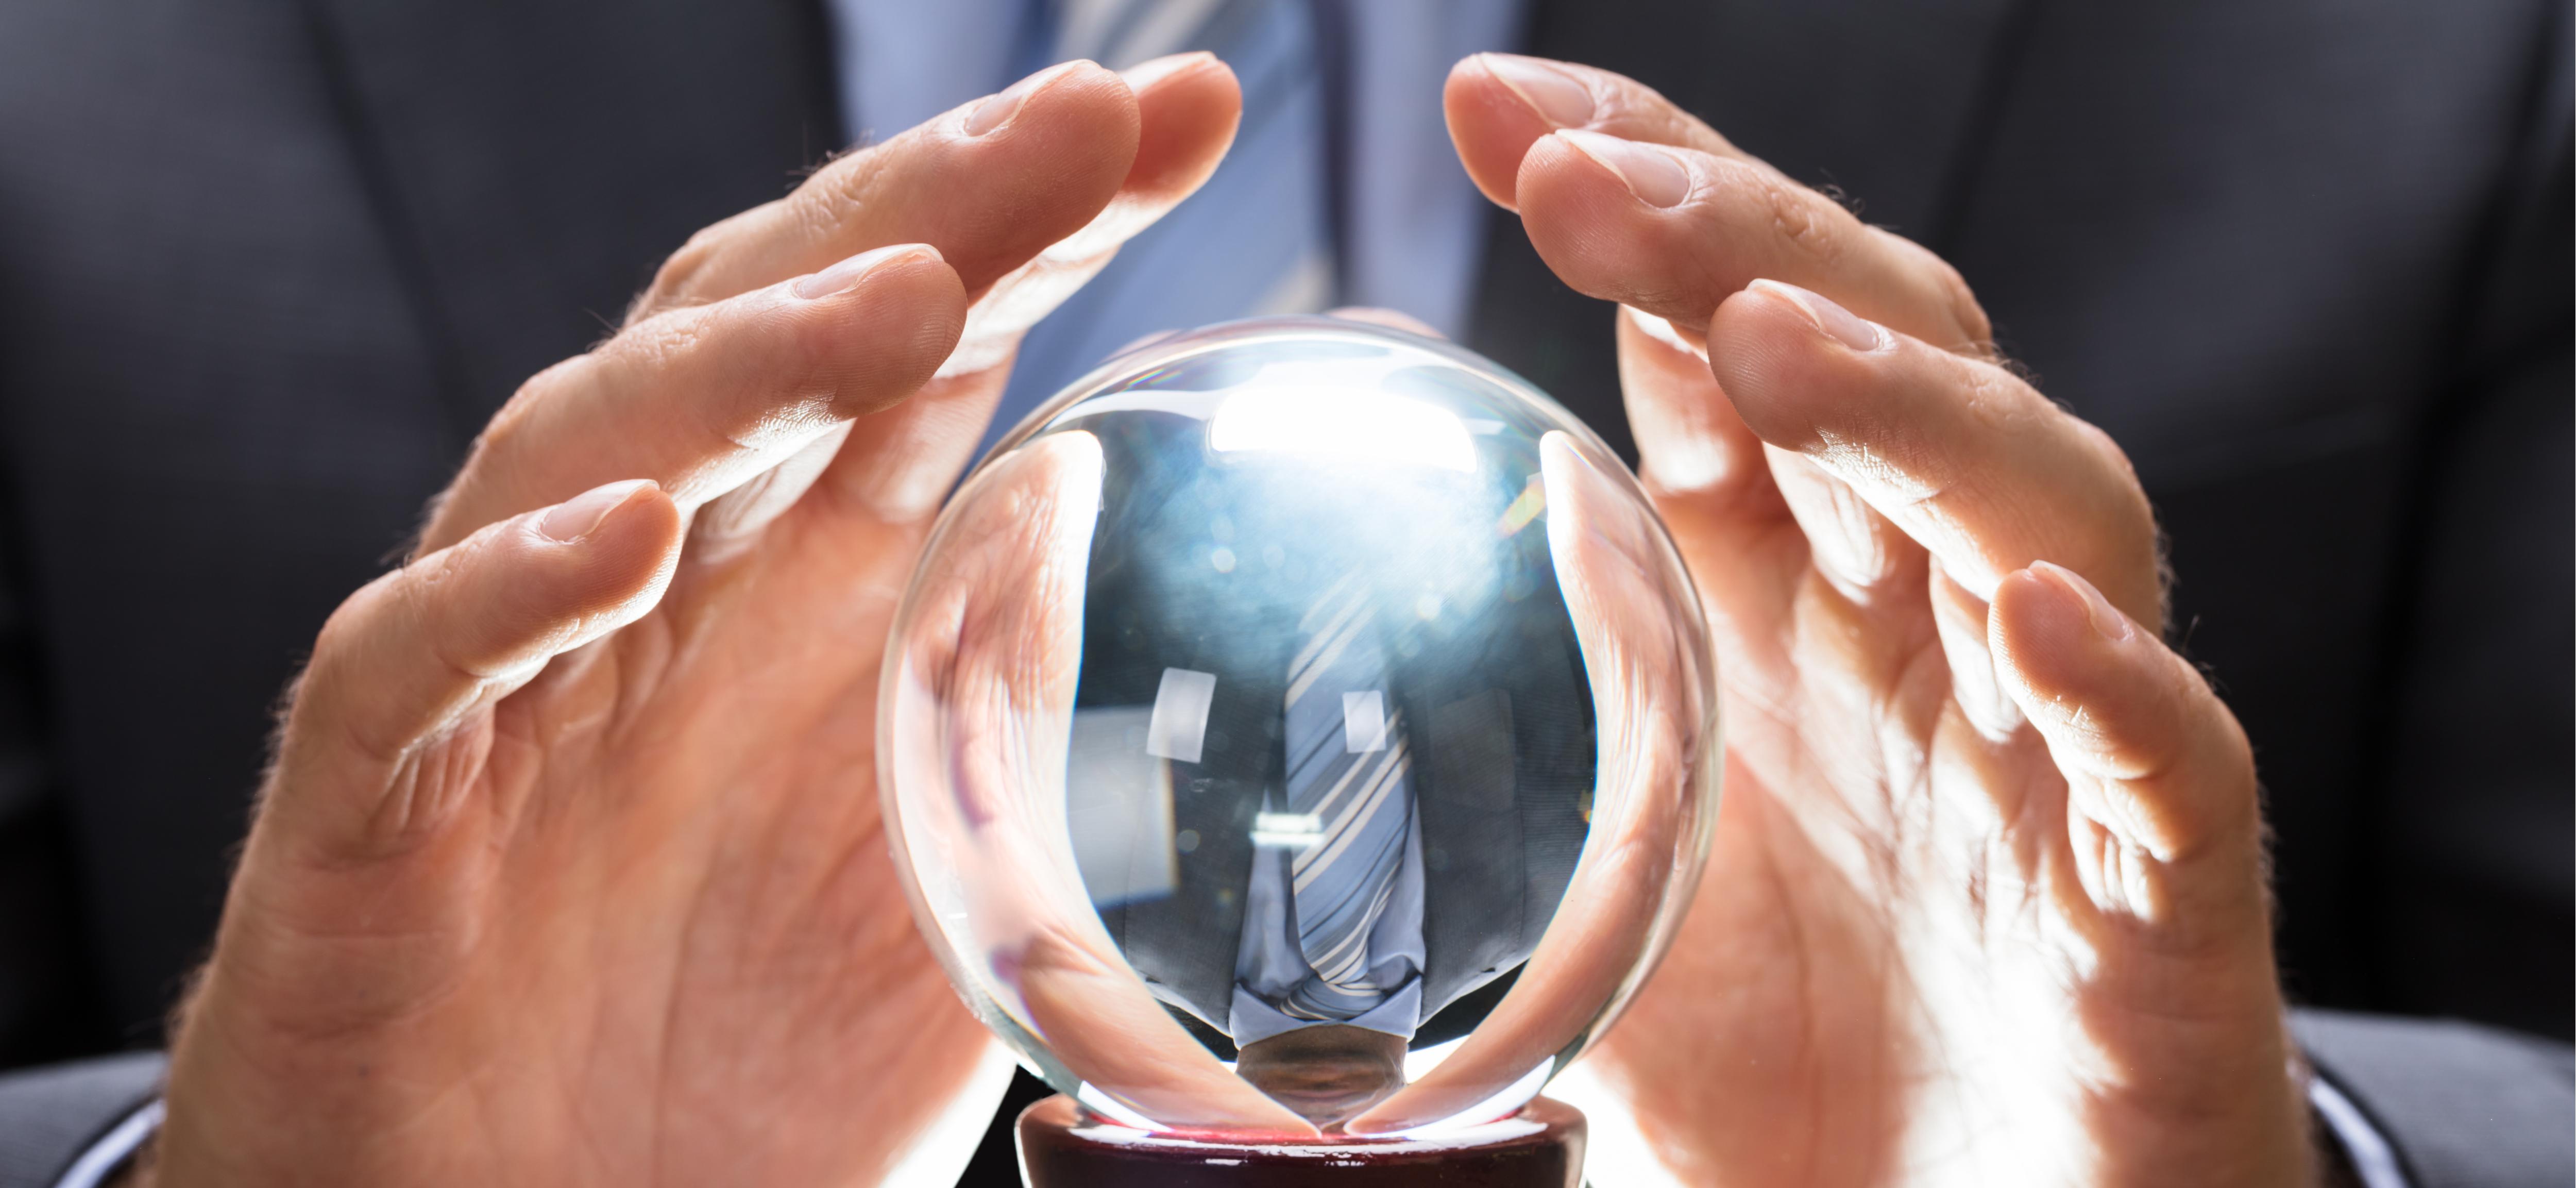 Glass ball prediction